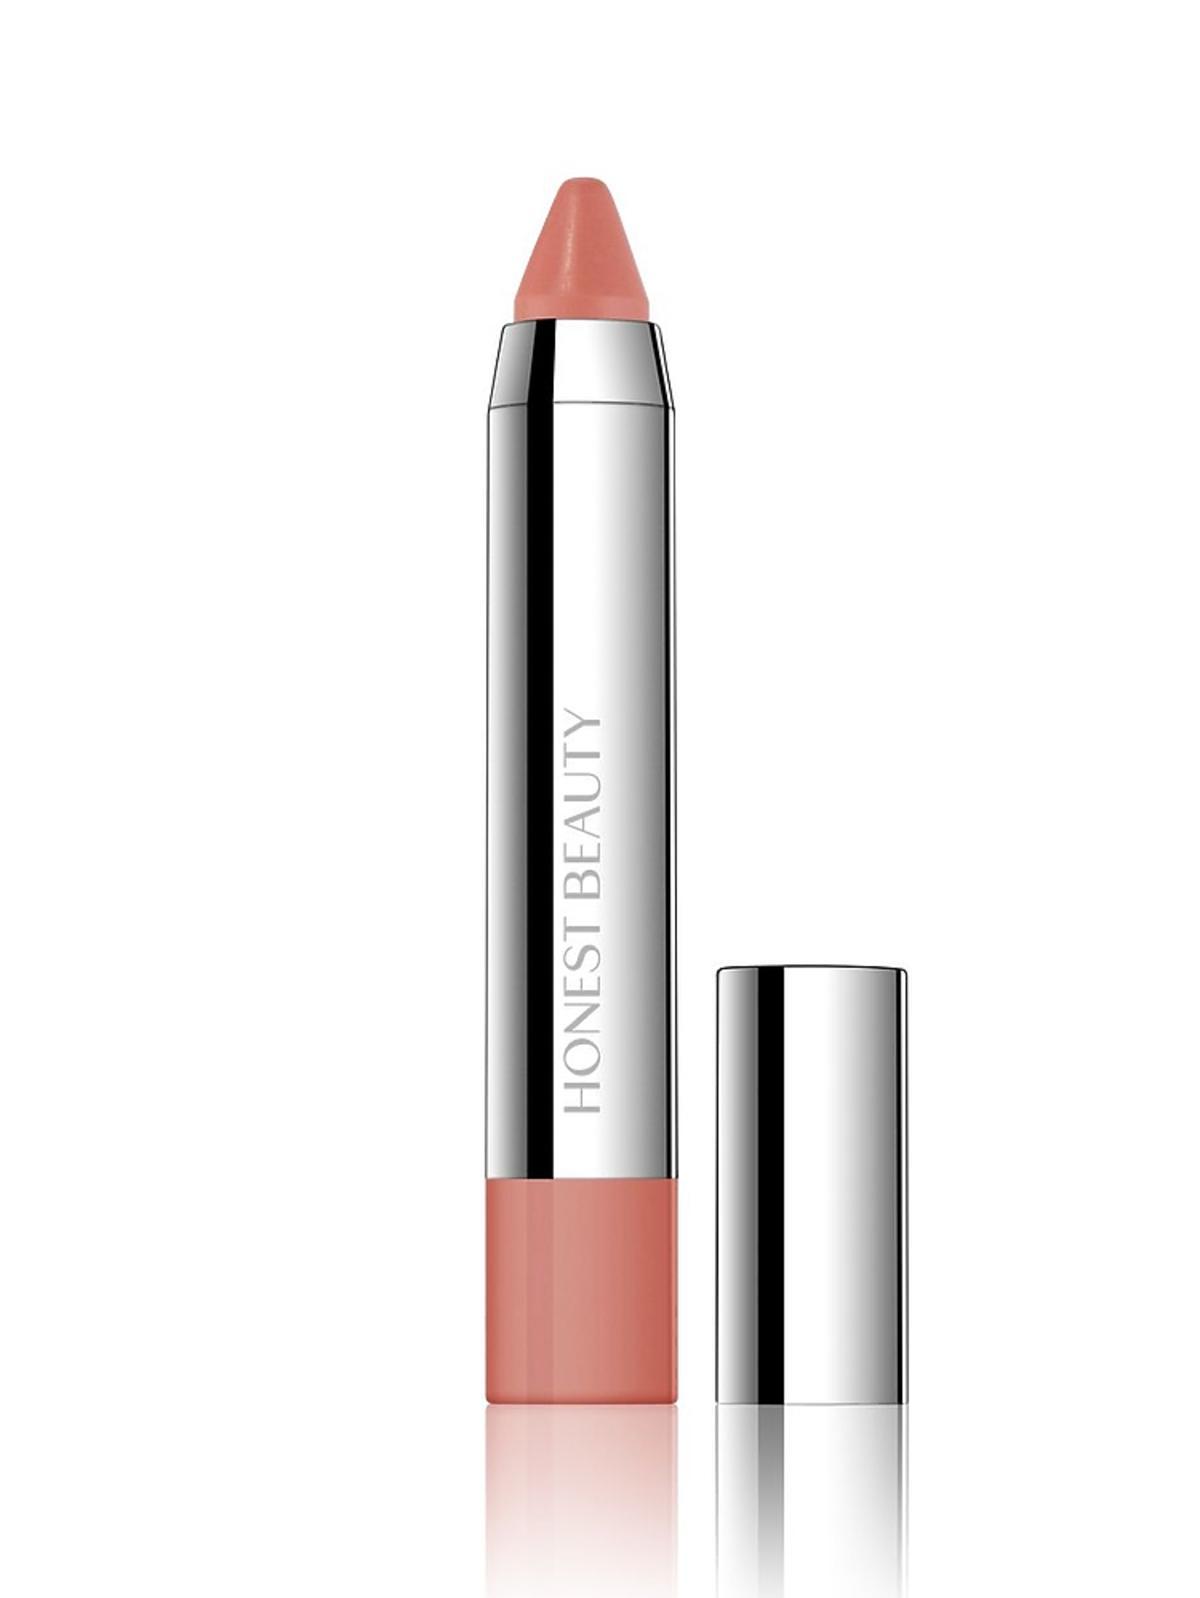 Kredka do ust Honest Beauty, Truly Kissable Lip Crayon w odcieeniu Sheer Chstnut Kiss, 65 zł